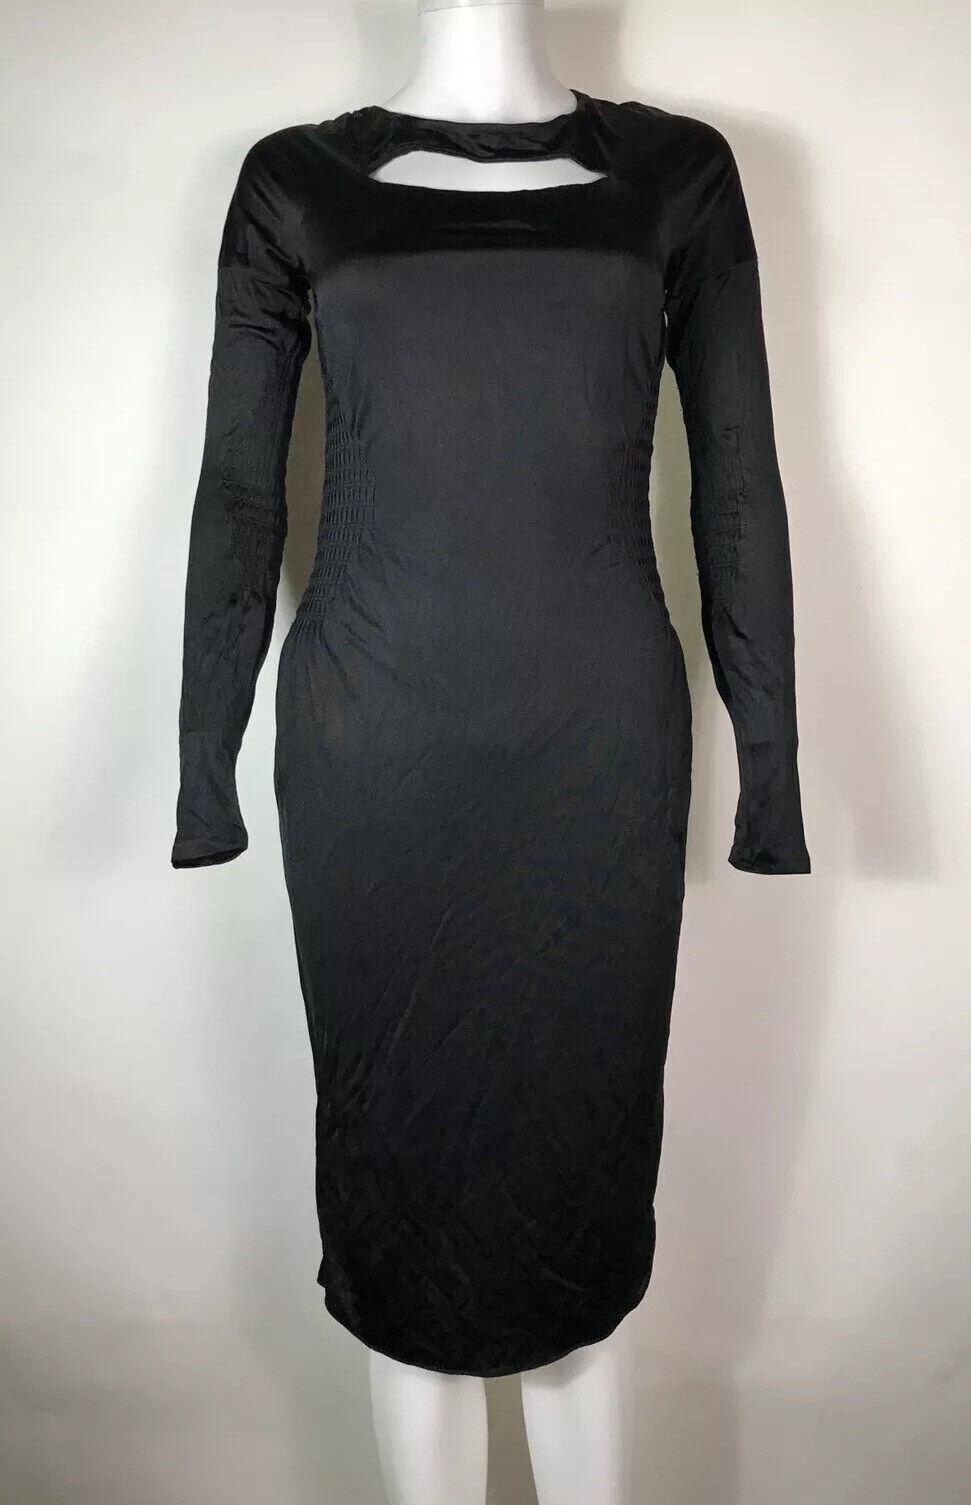 Rare Vtg Gucci Black Cut Out Dress S - image 3